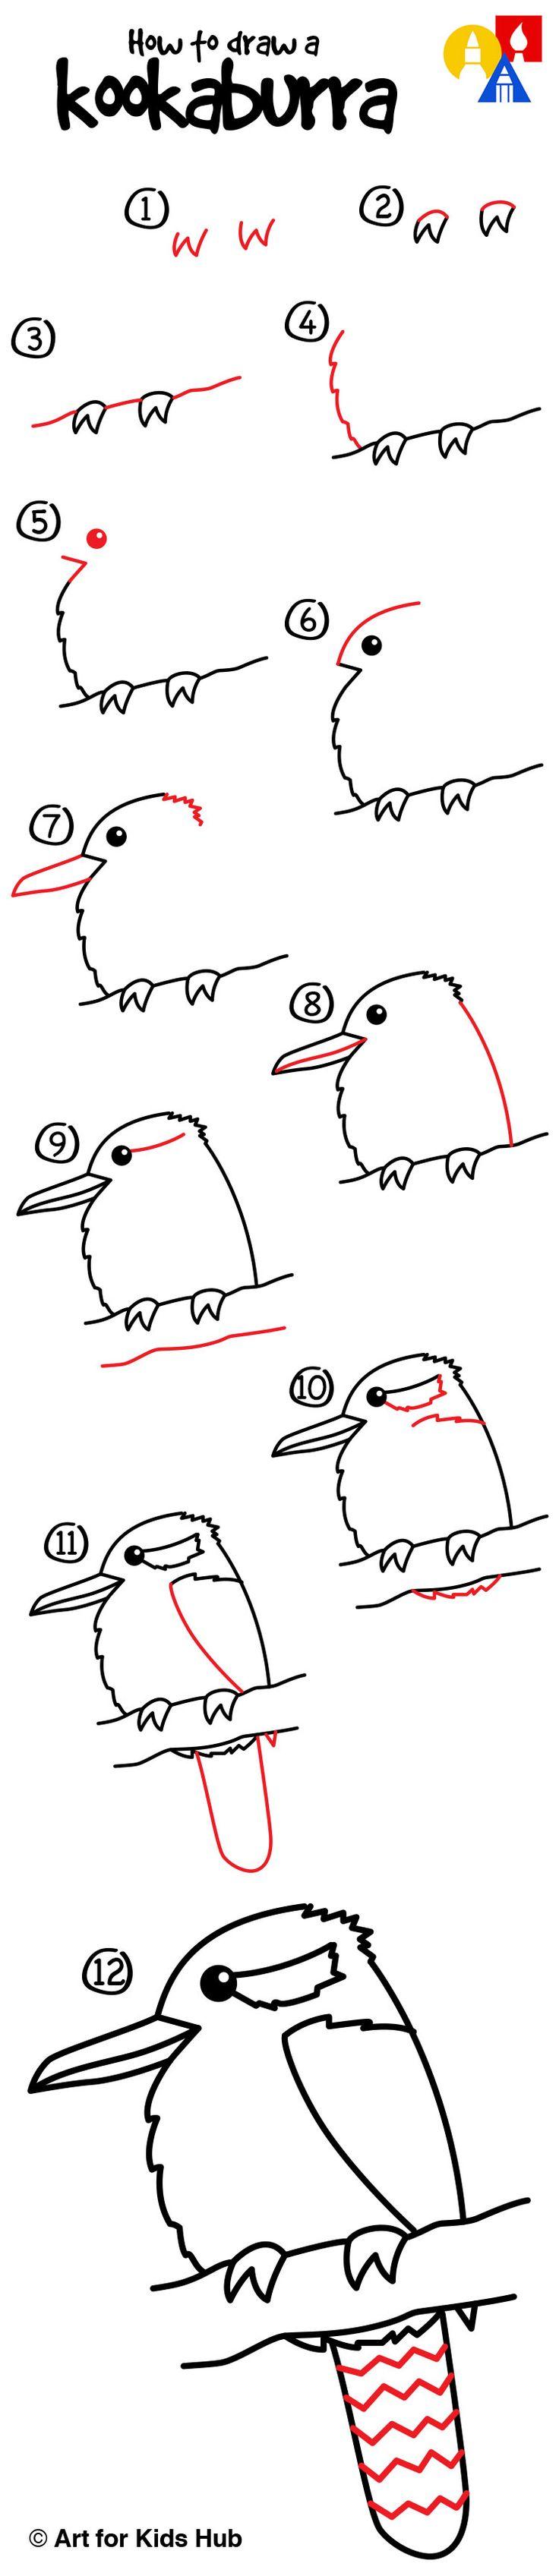 How to draw a kookaburra!